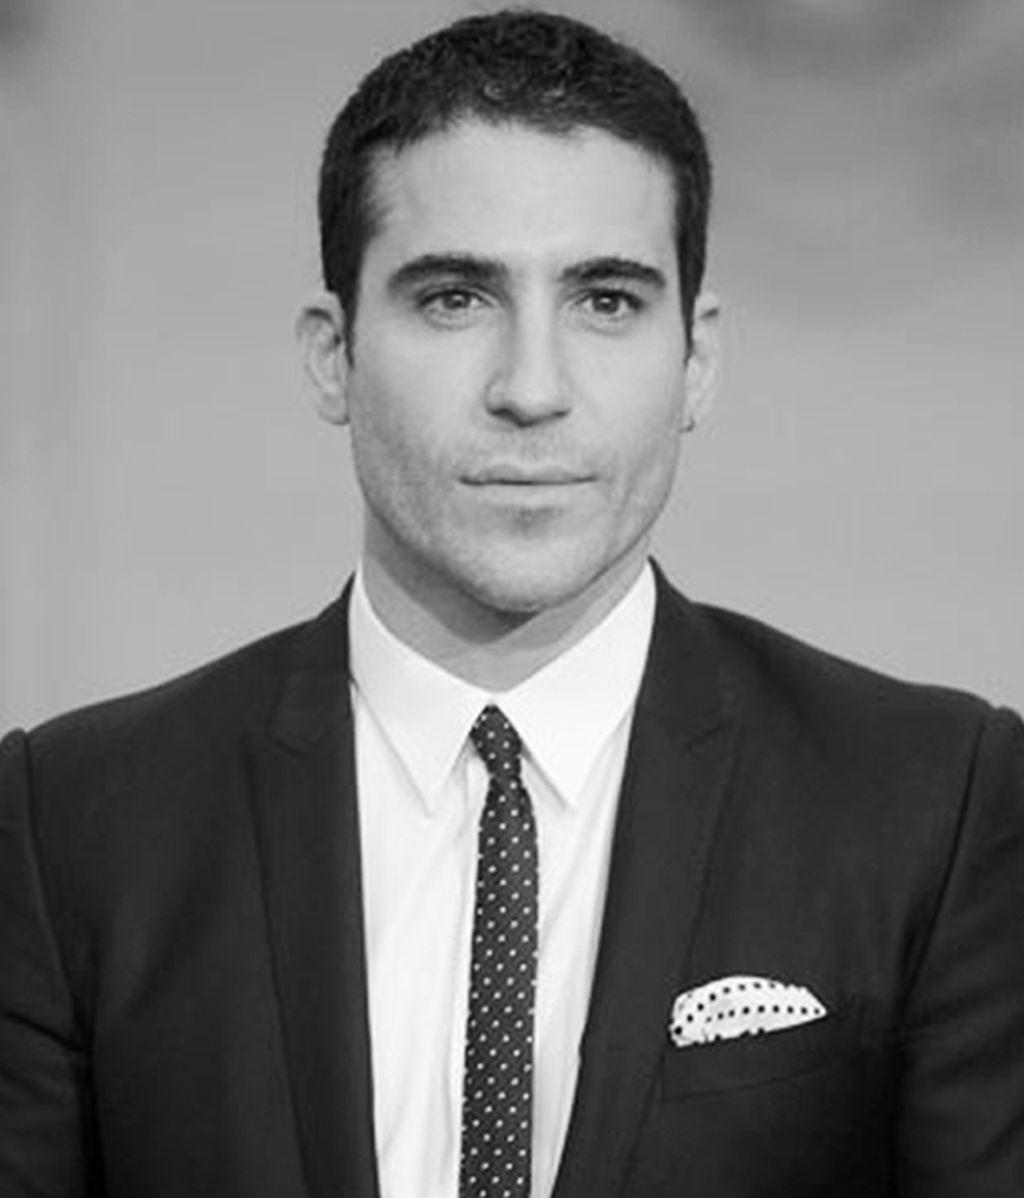 Miguel-Silvestre